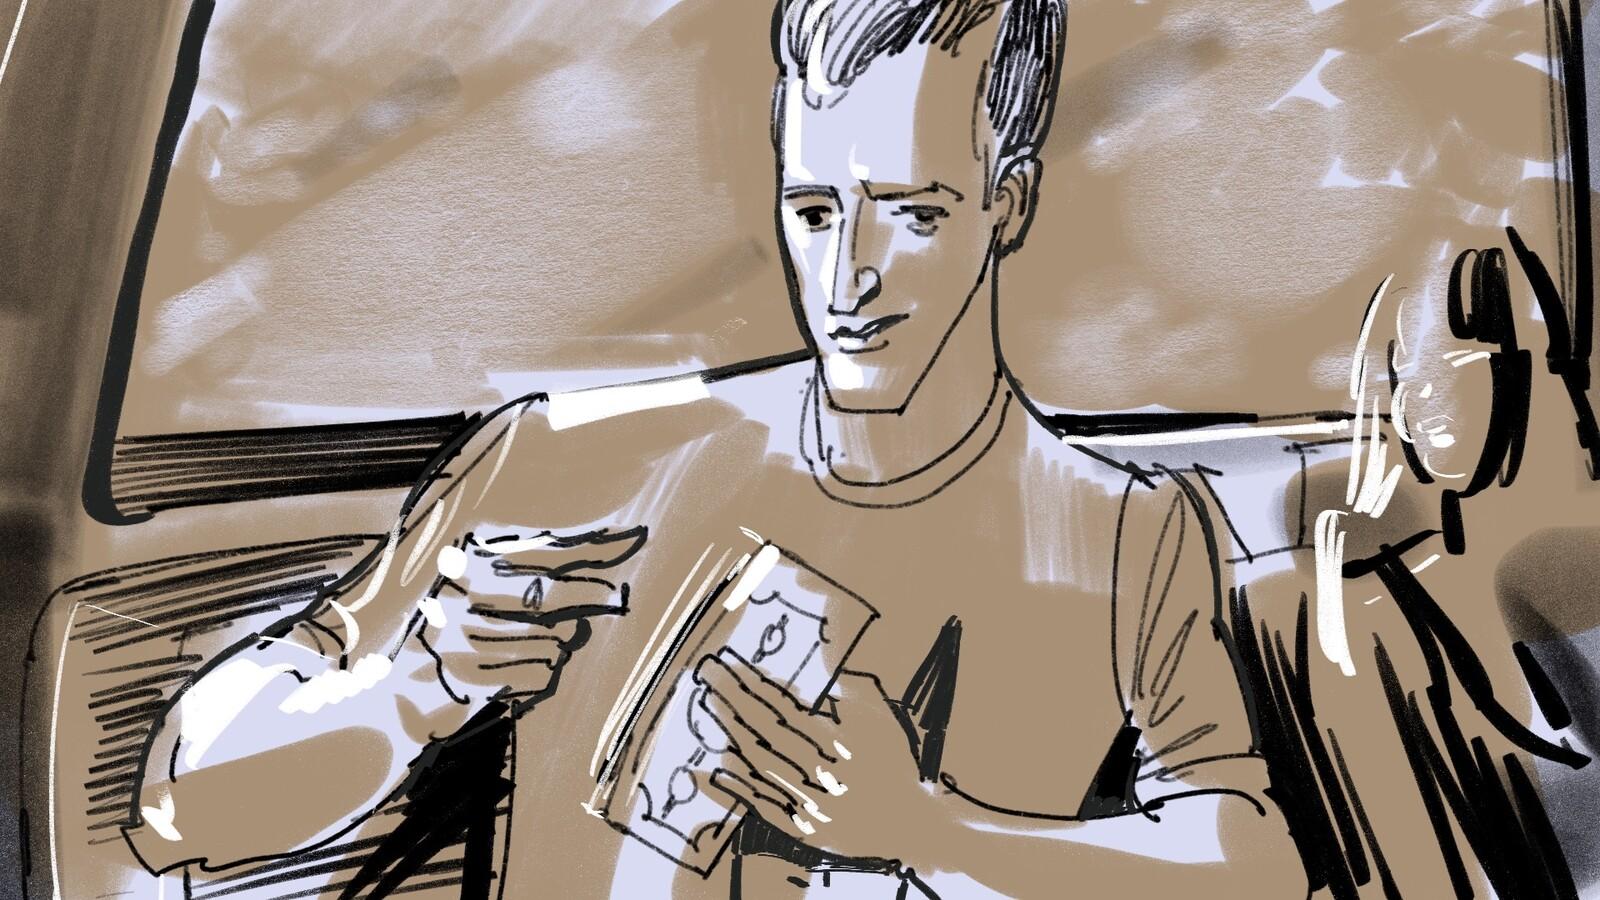 FRAME #28-MS-Med-Floating: Nick pulls out a wad of cash.